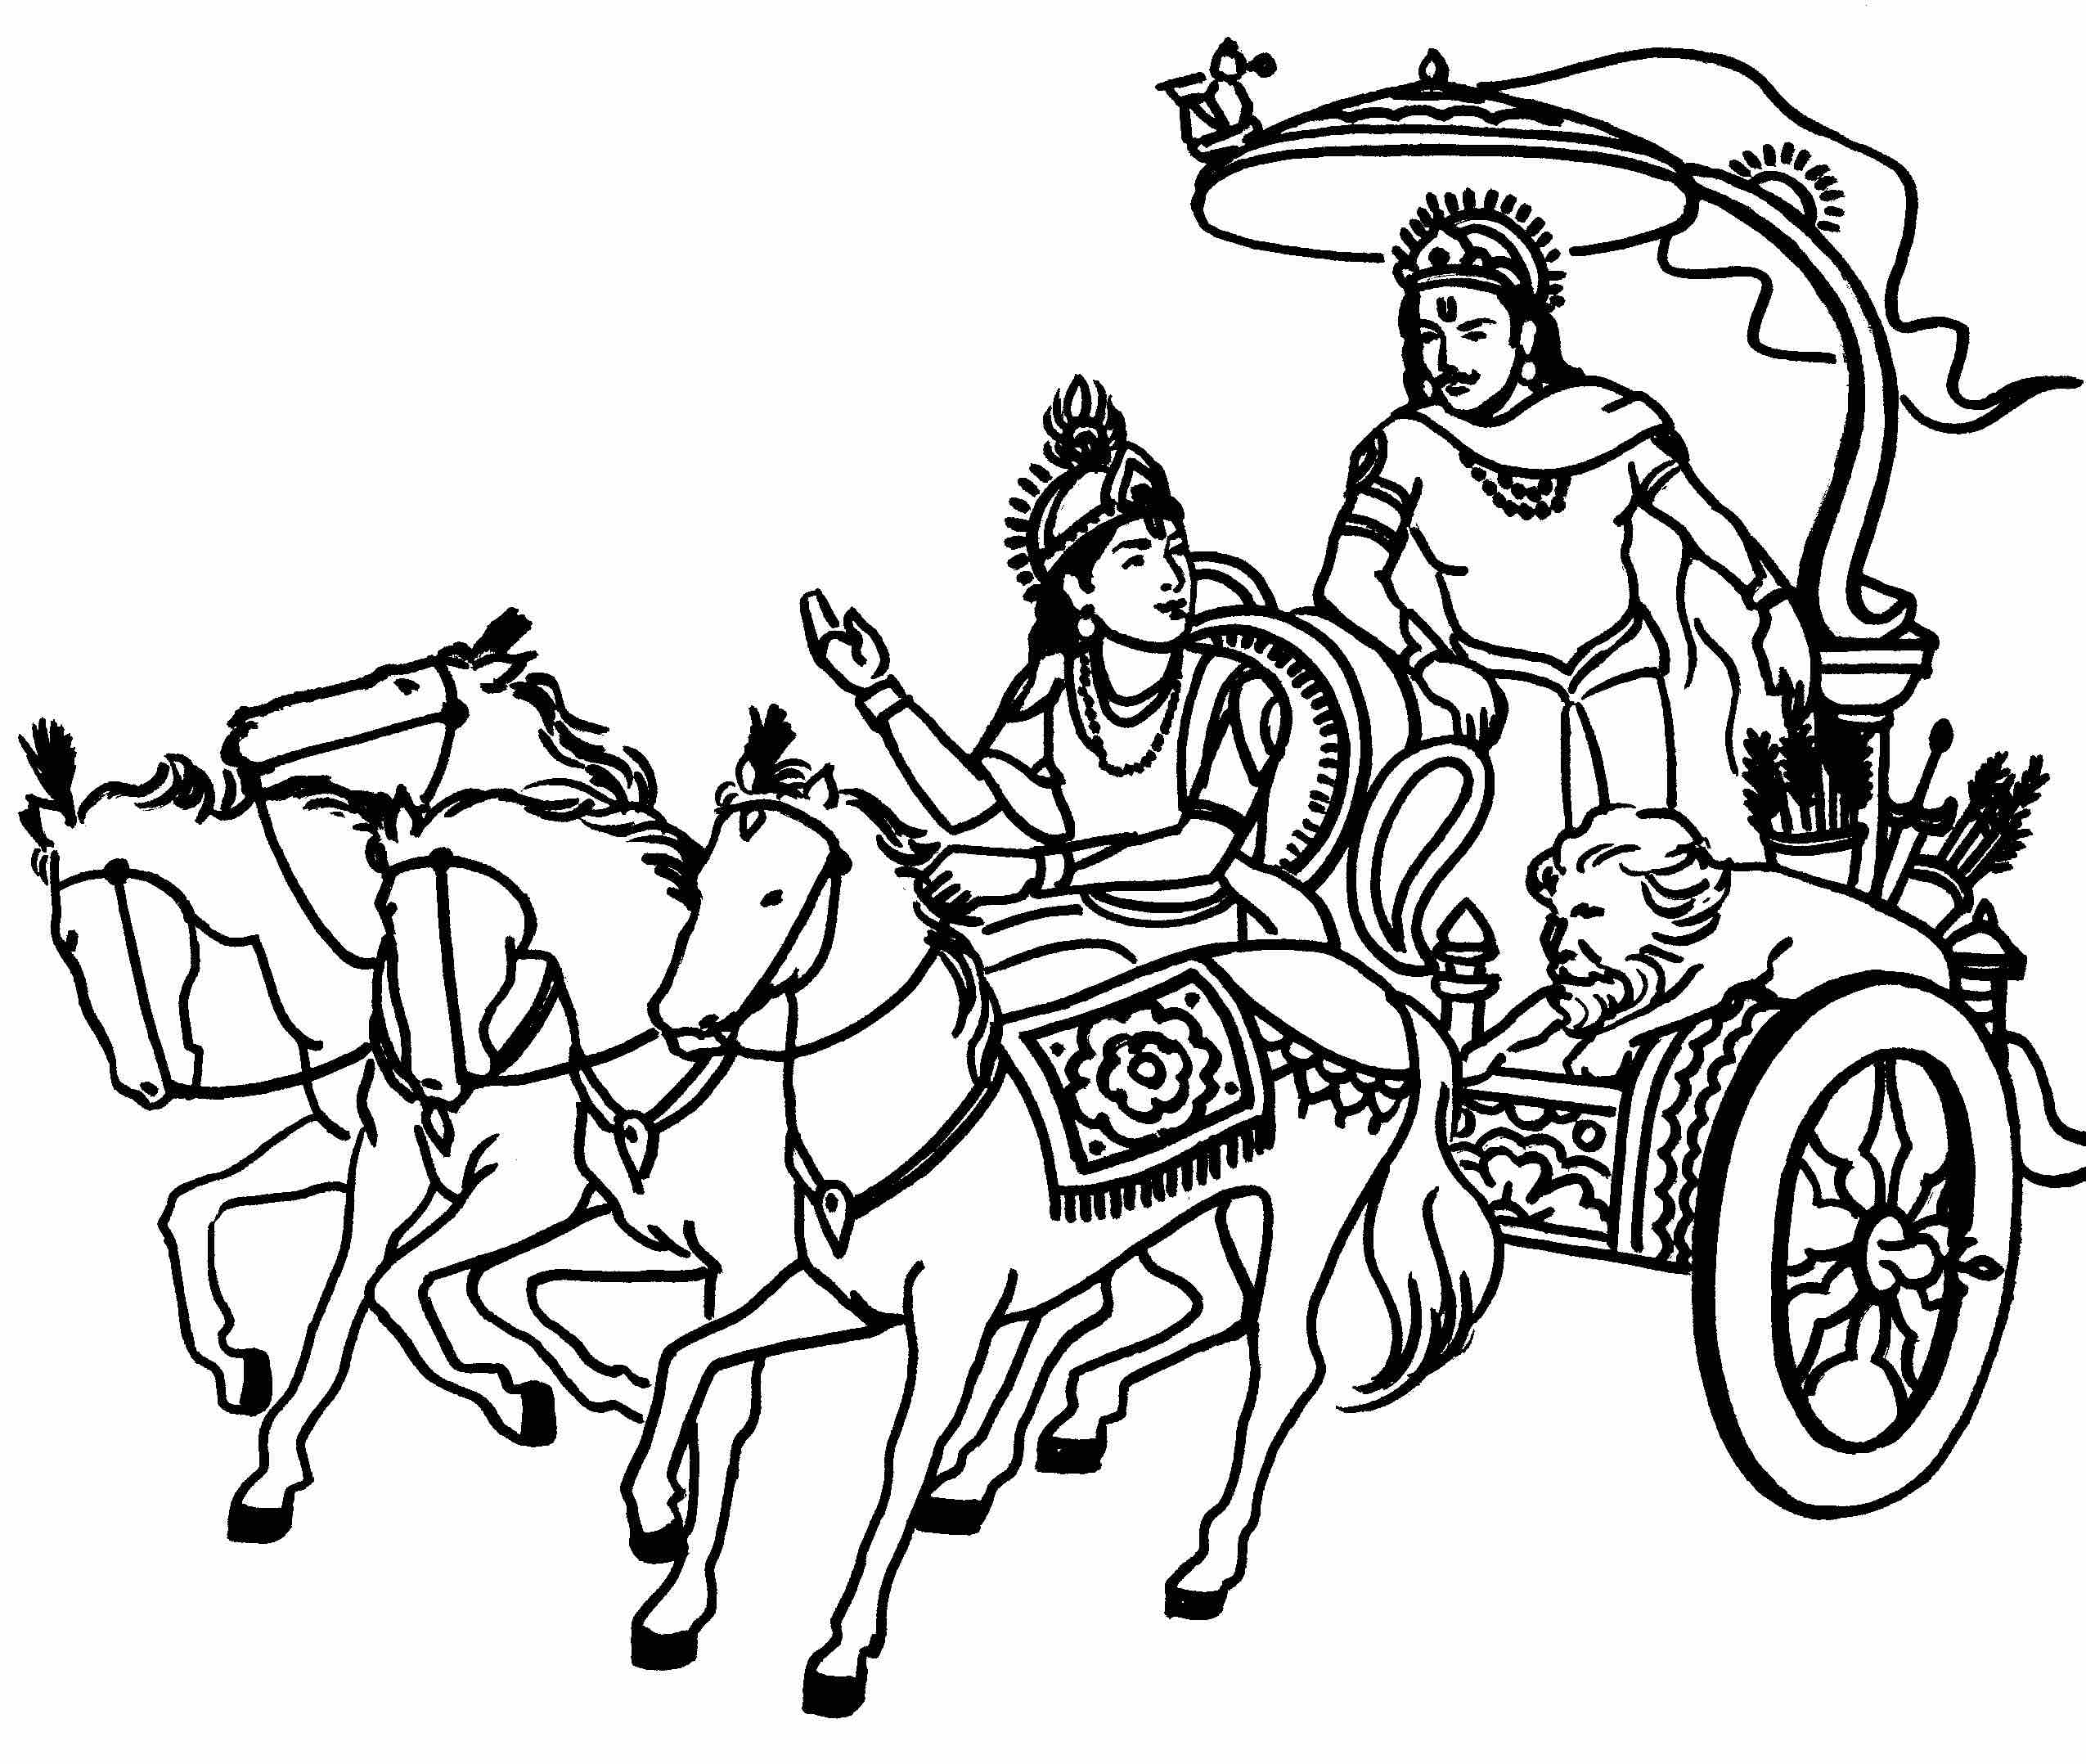 saraswati coloring pages - saraswati mata logo black and white clipart best